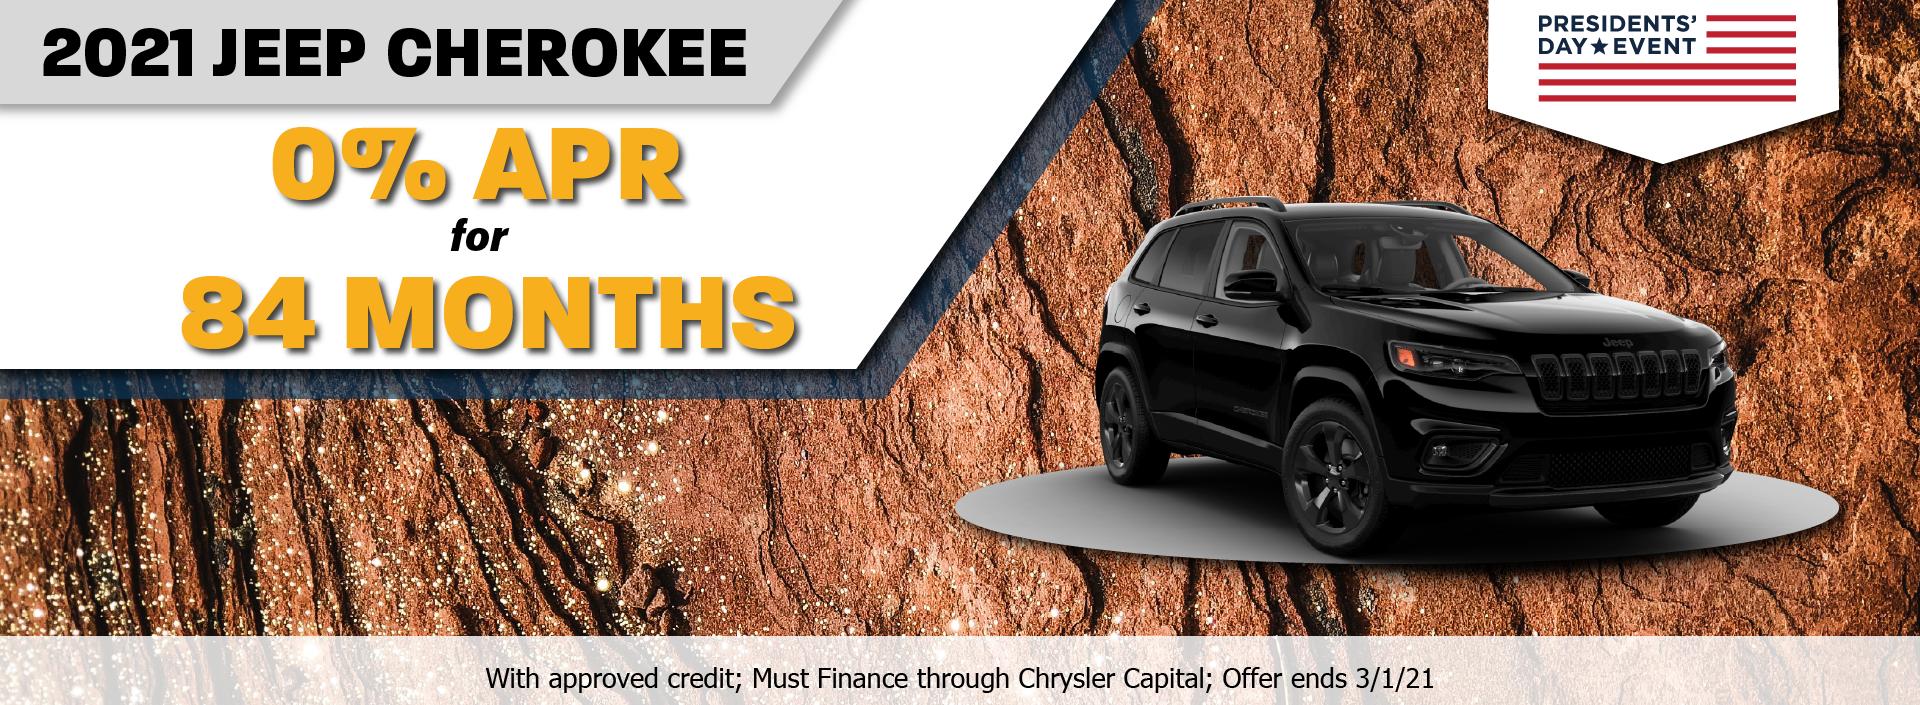 2021 Jeep Cherokee Feburary